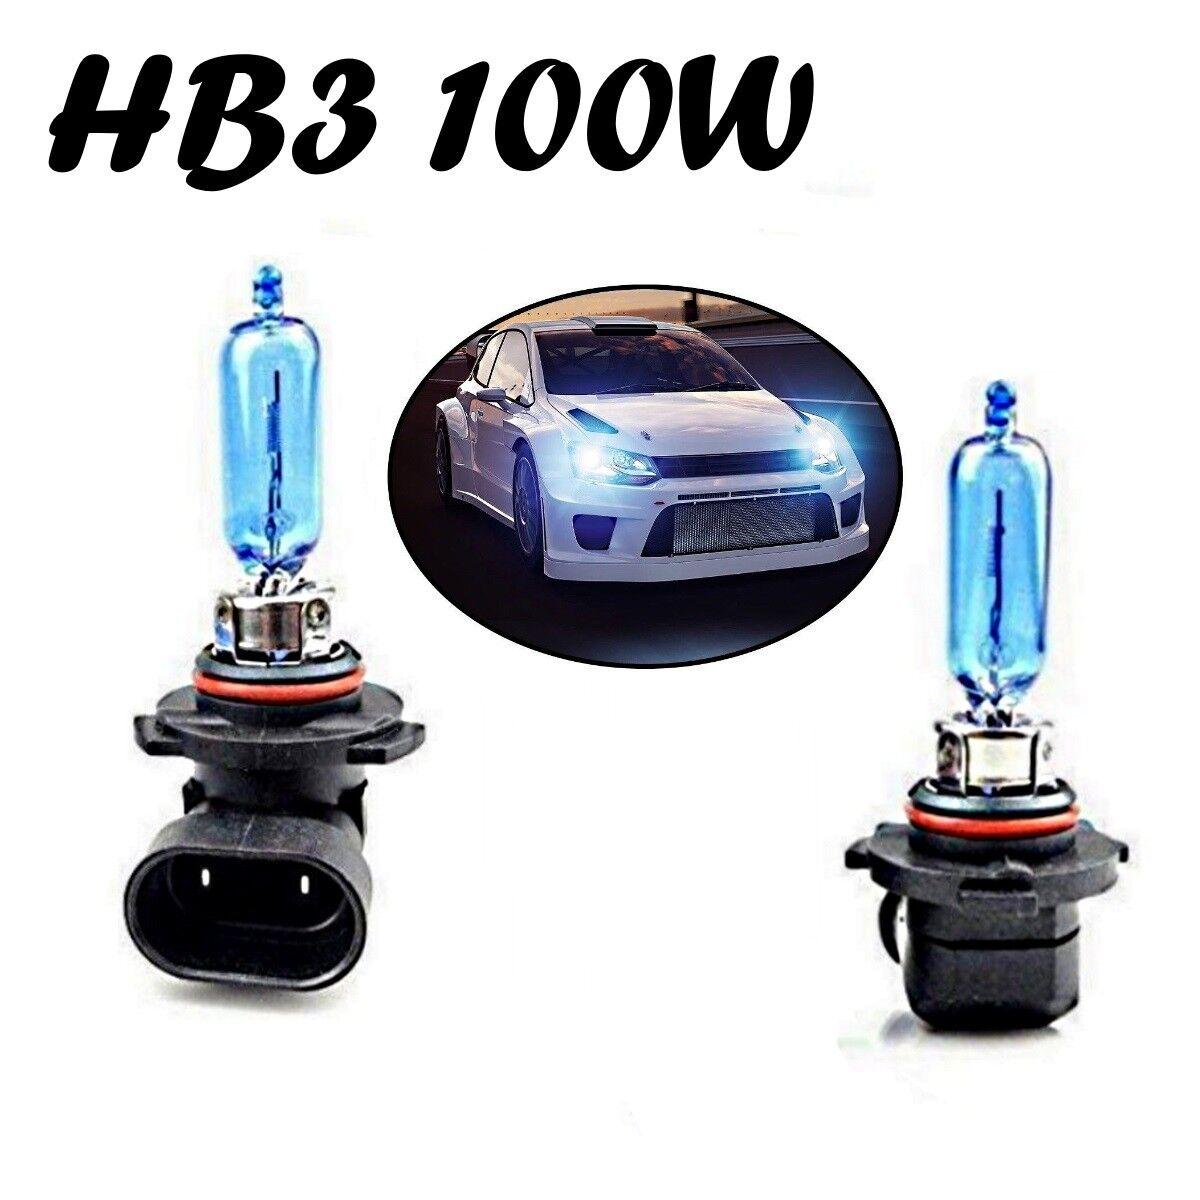 2x H8 H9 H11 3000K 100W Hochleistungs-CREE LED Nebelscheinwerfer Canbus Lampe DE